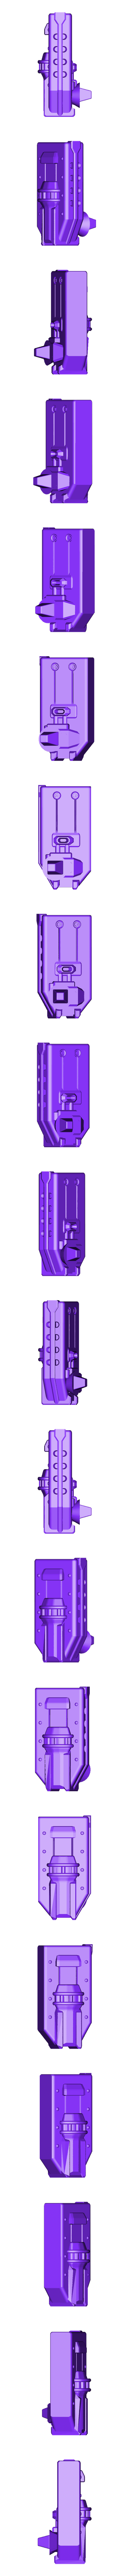 Laser_-_L.stl Download free STL file EC-099 Assault Bot - 28-32mm gaming • 3D printer template, ec3d